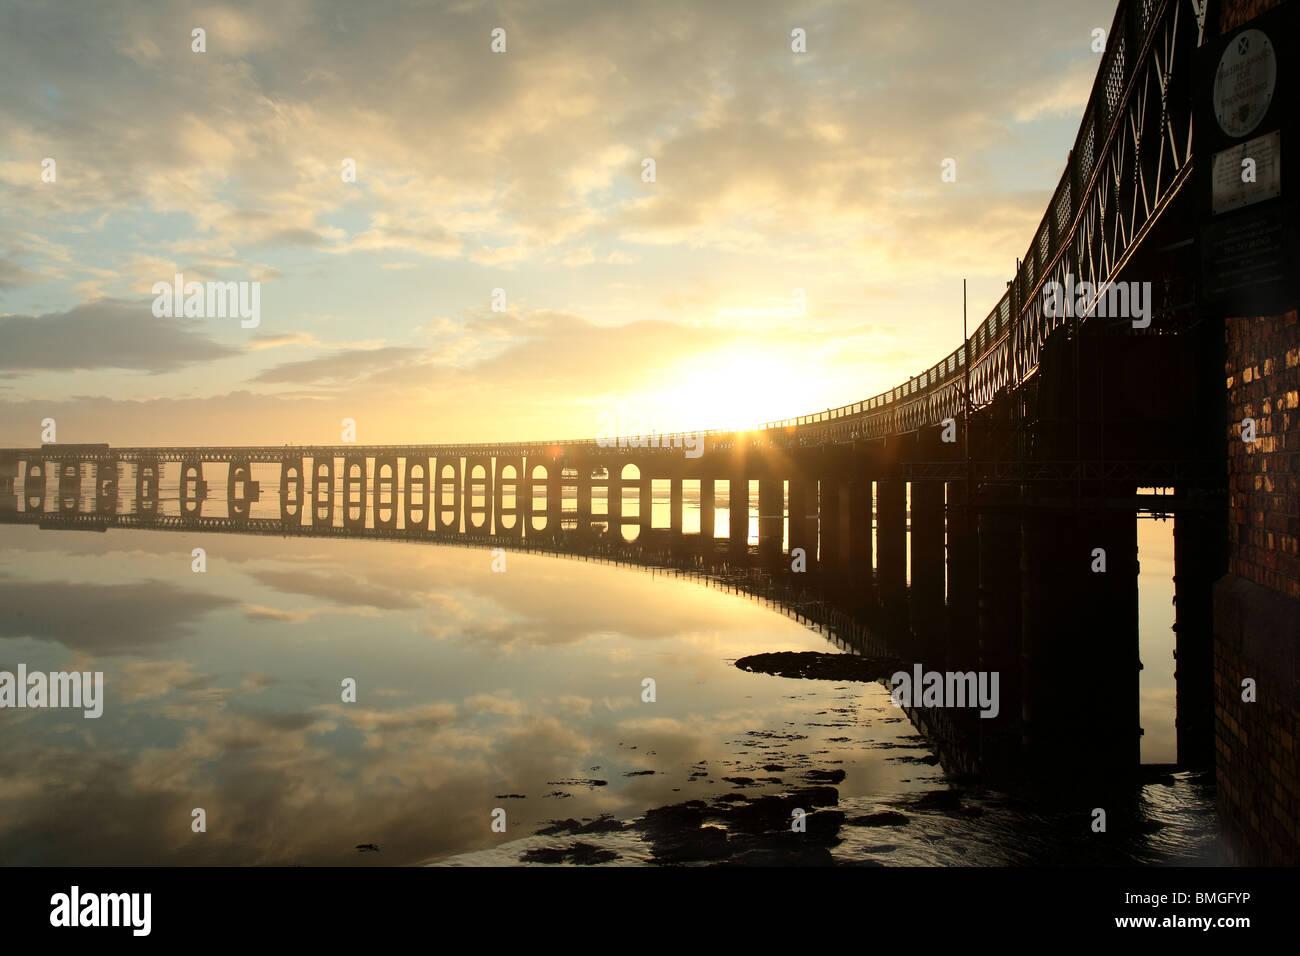 tay rail bridge - Stock Image